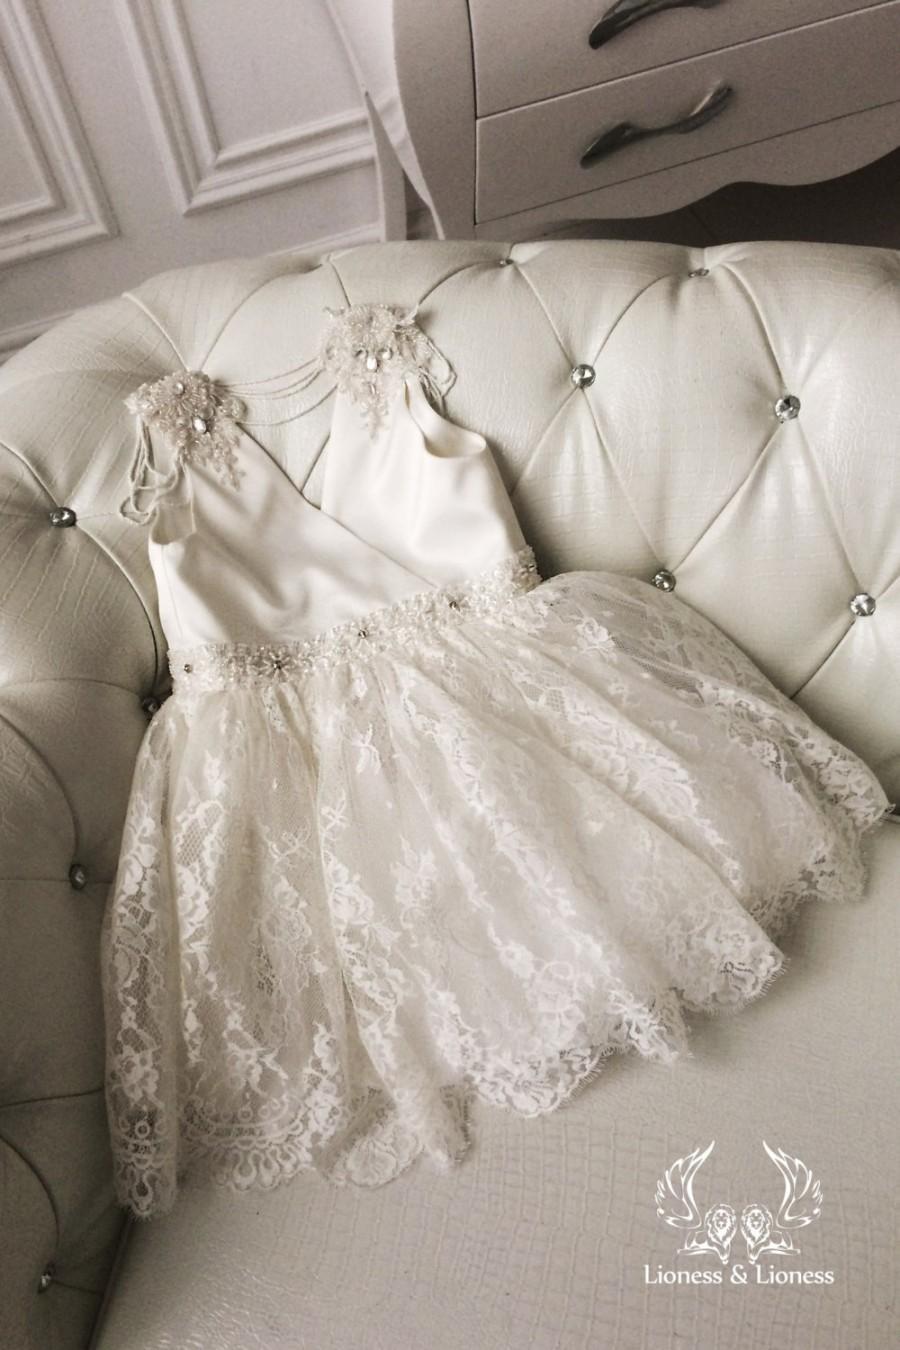 7a68e0bc90f Ivory Flower Girl Dress Flowers Dress Lace Dress Wedding Dress Birthday  Dress Toddler Tutu Dress